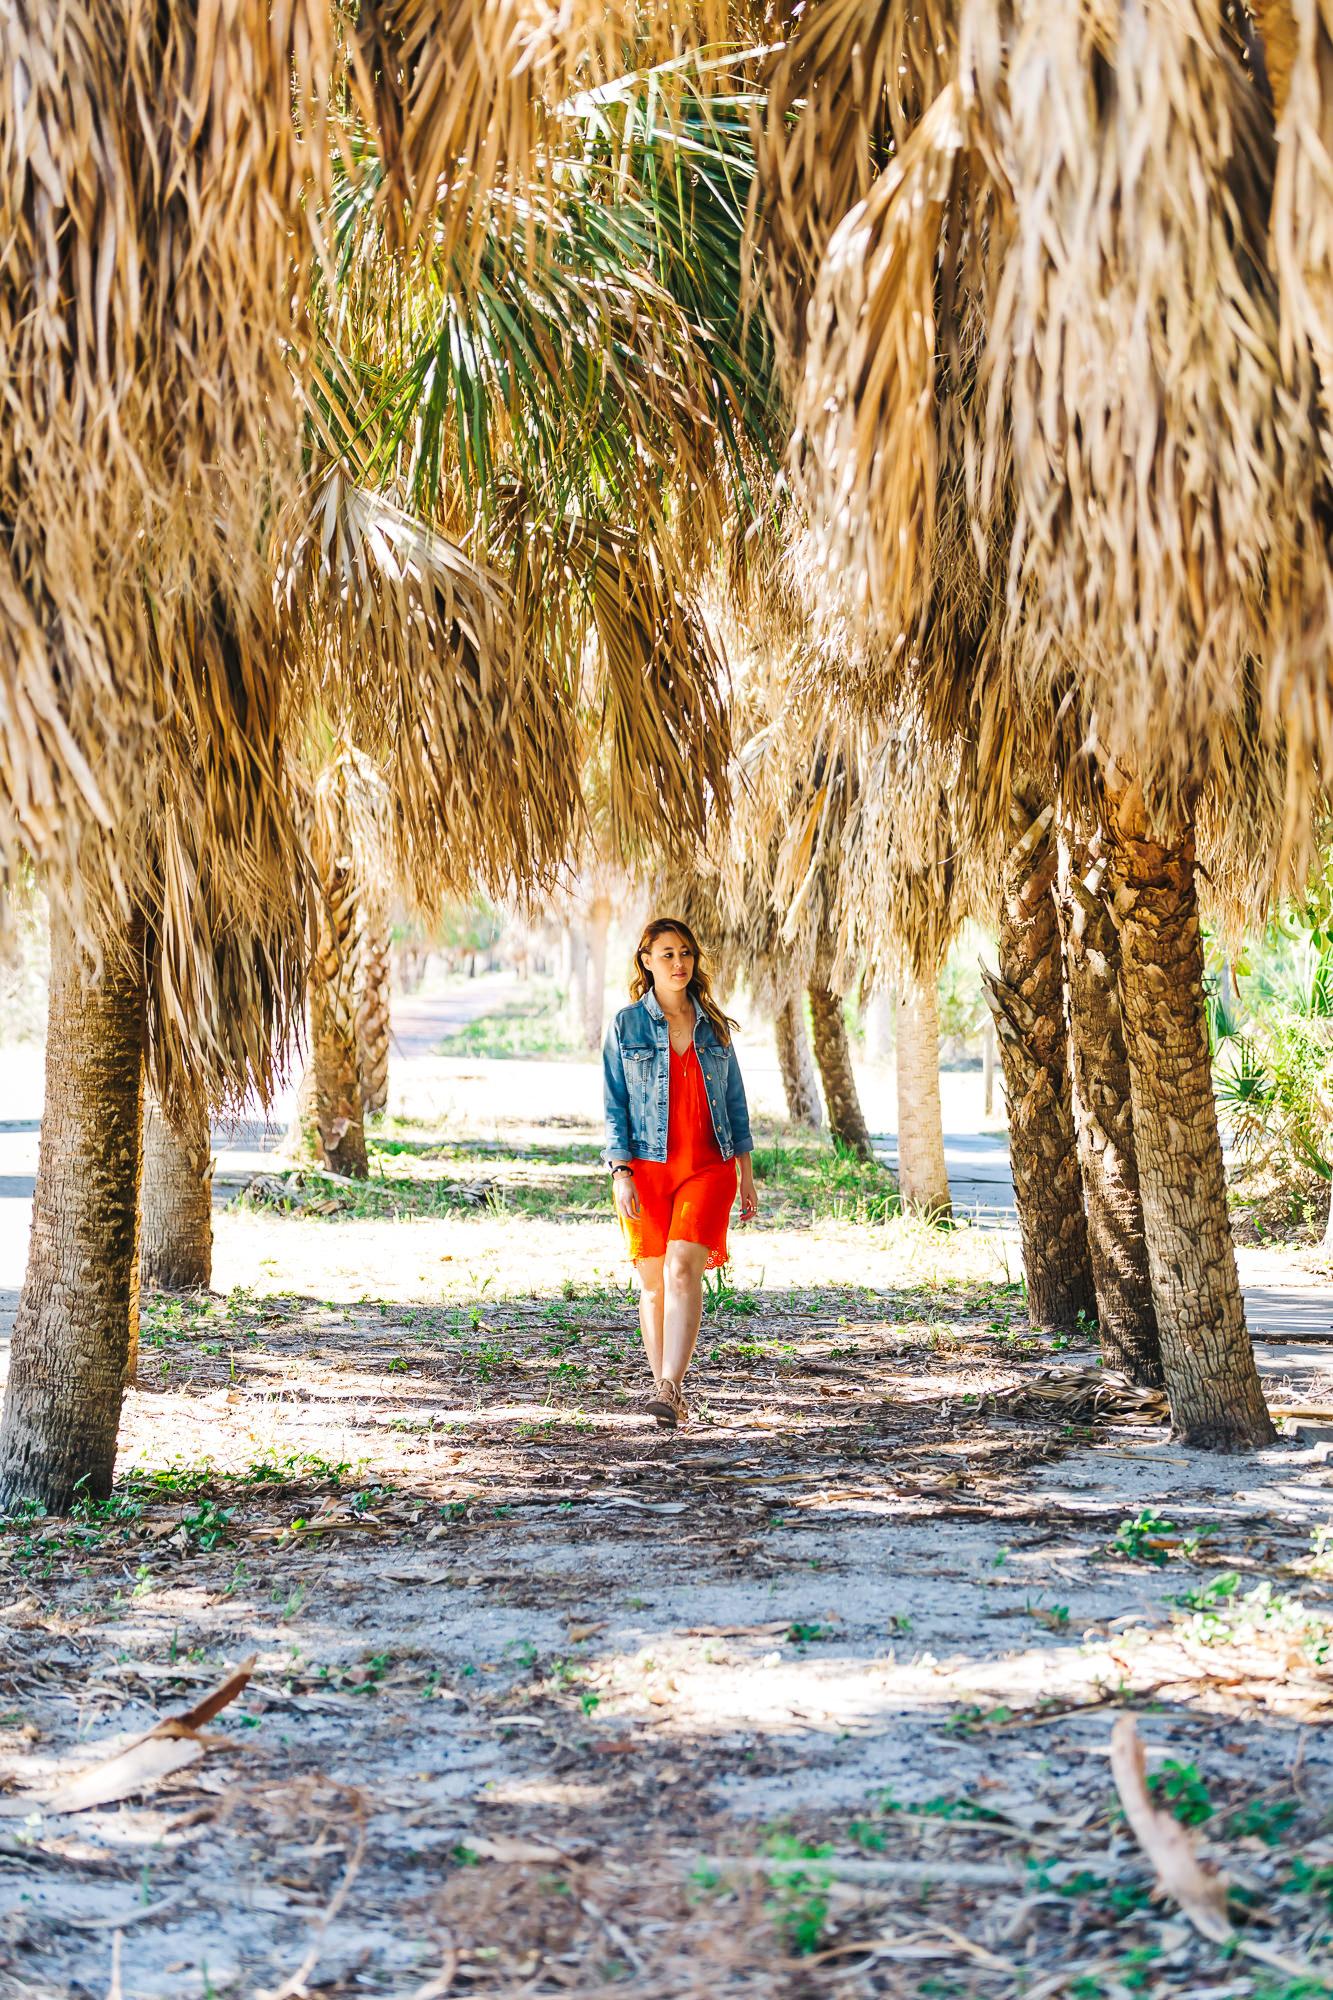 Exploring the trails of Egmont Key